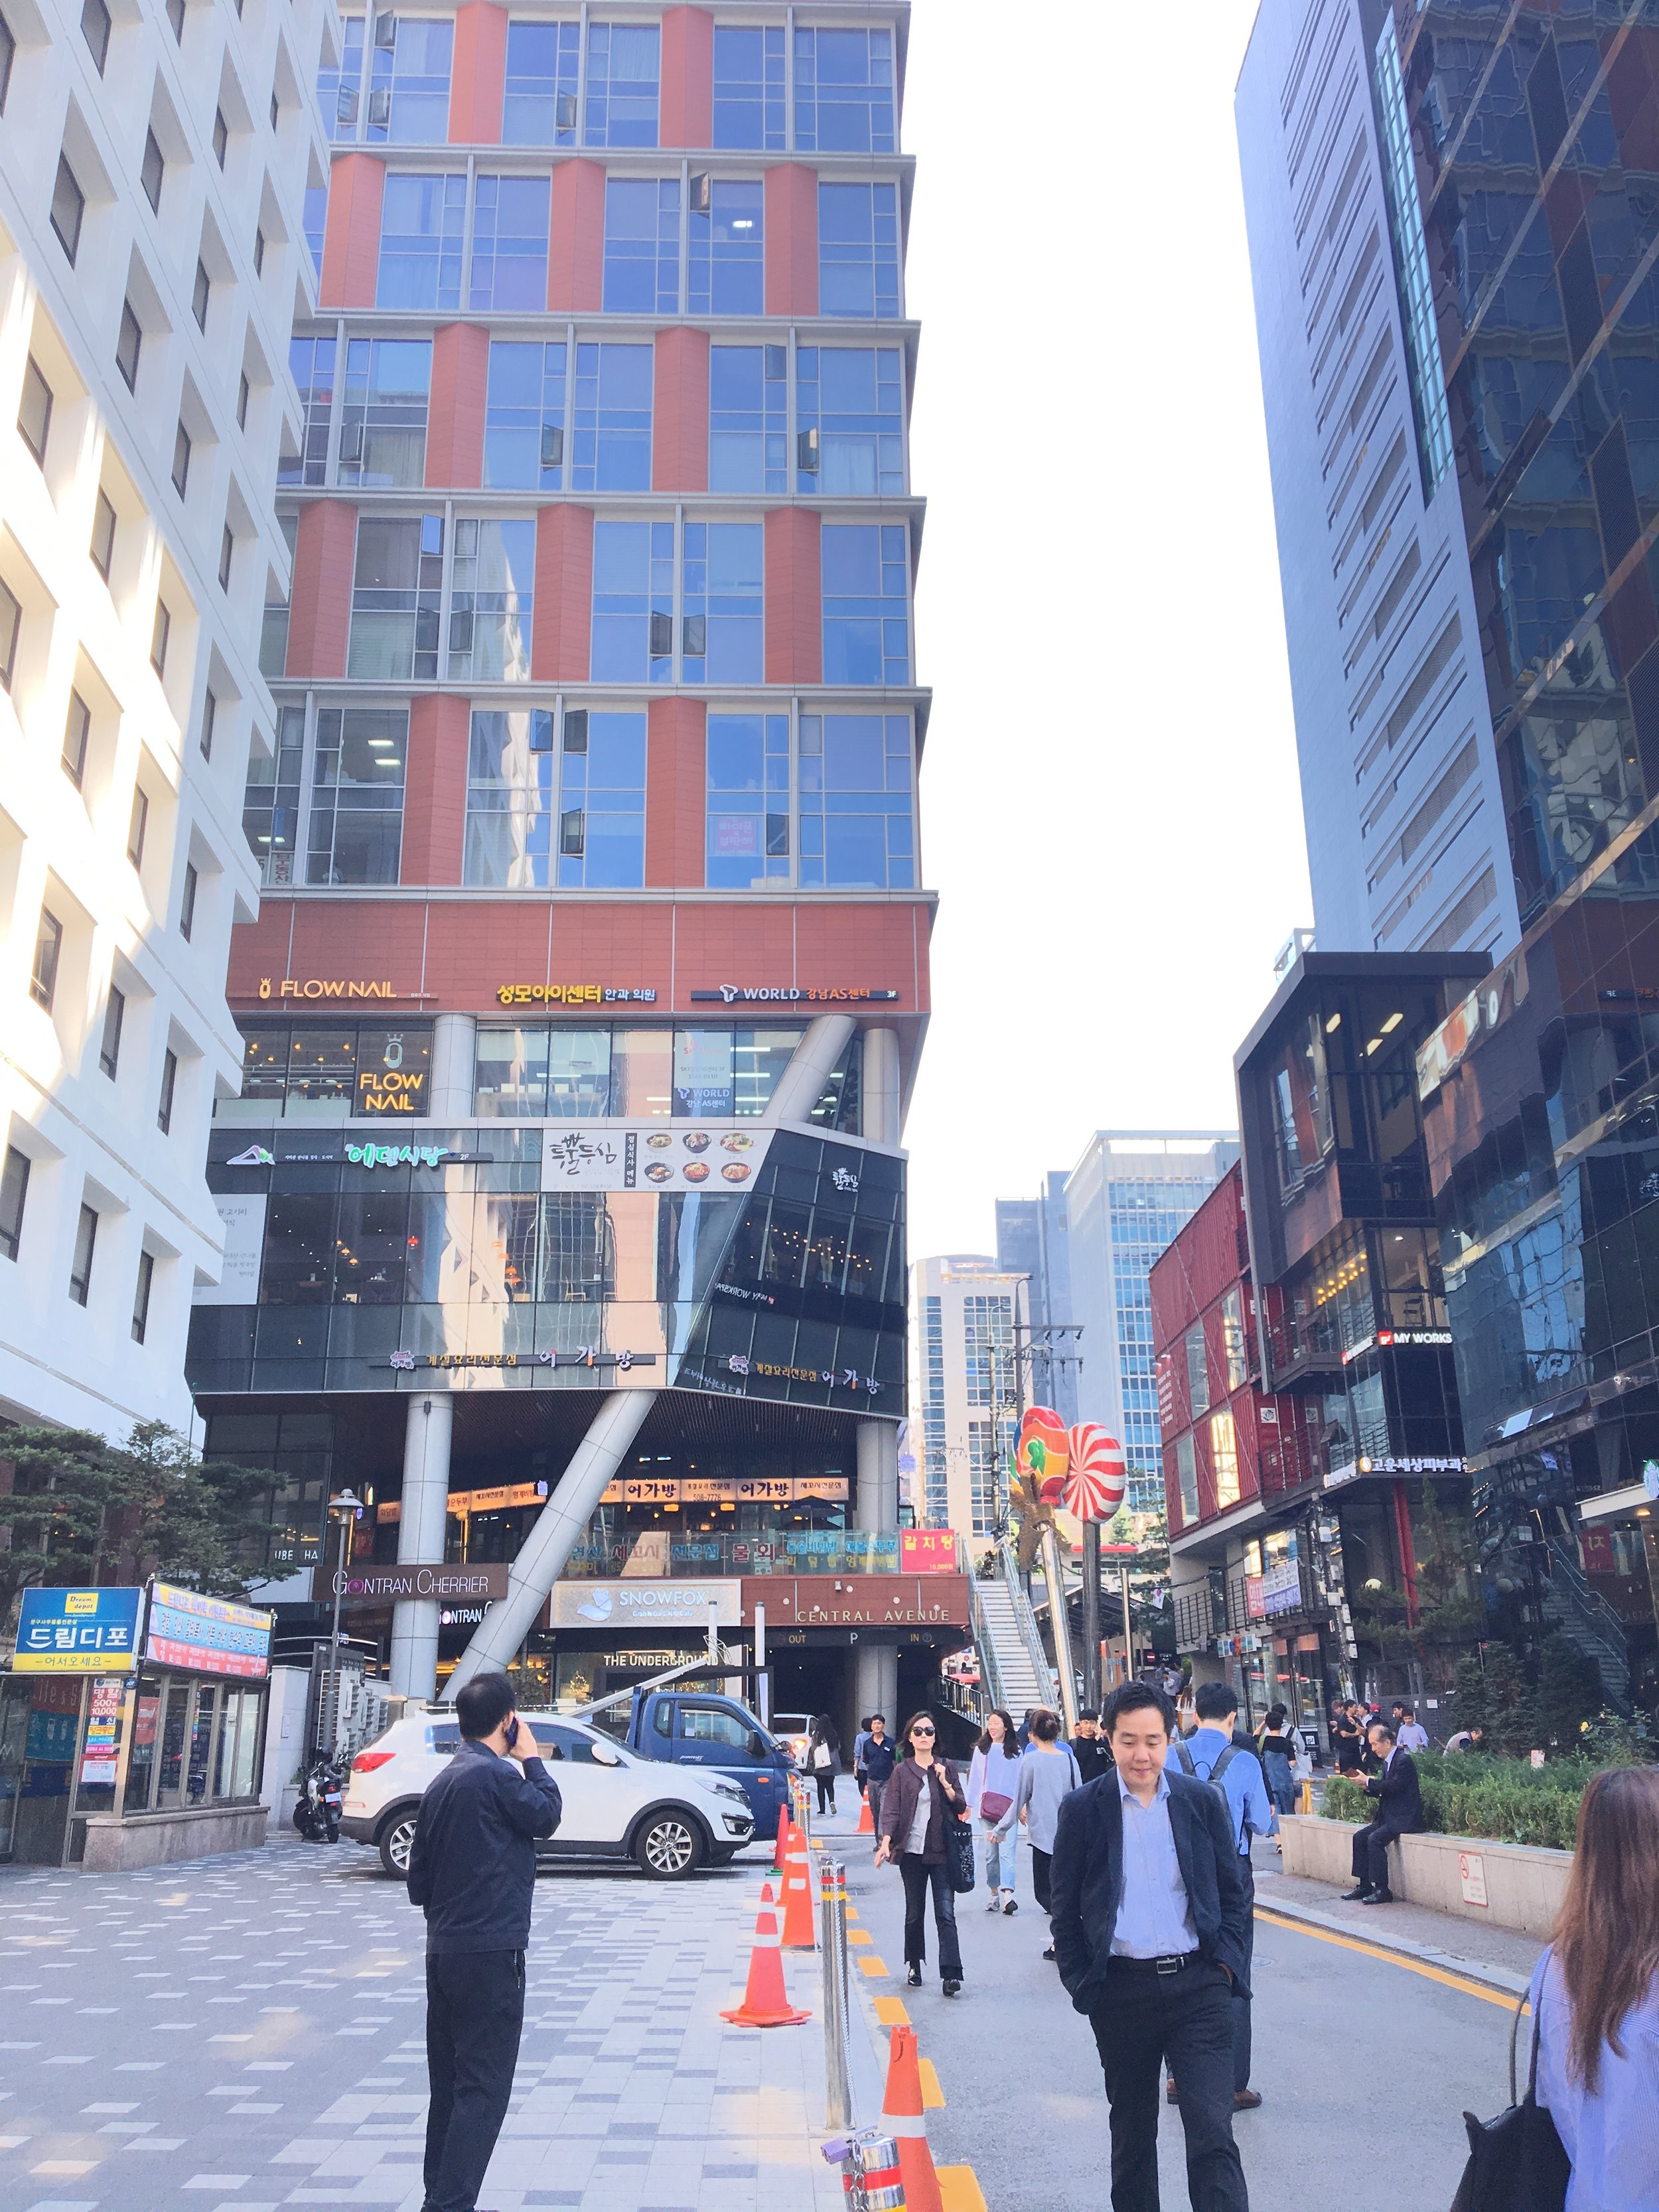 "4. Mike Homes 即為左手邊的棕色建築物 - 您會先路過一家星巴克位於您的右手邊,當您走到棕色建築內會看到""Central Avenue""的標誌,接著您會您會路過一家名為Snoxfox的商店"